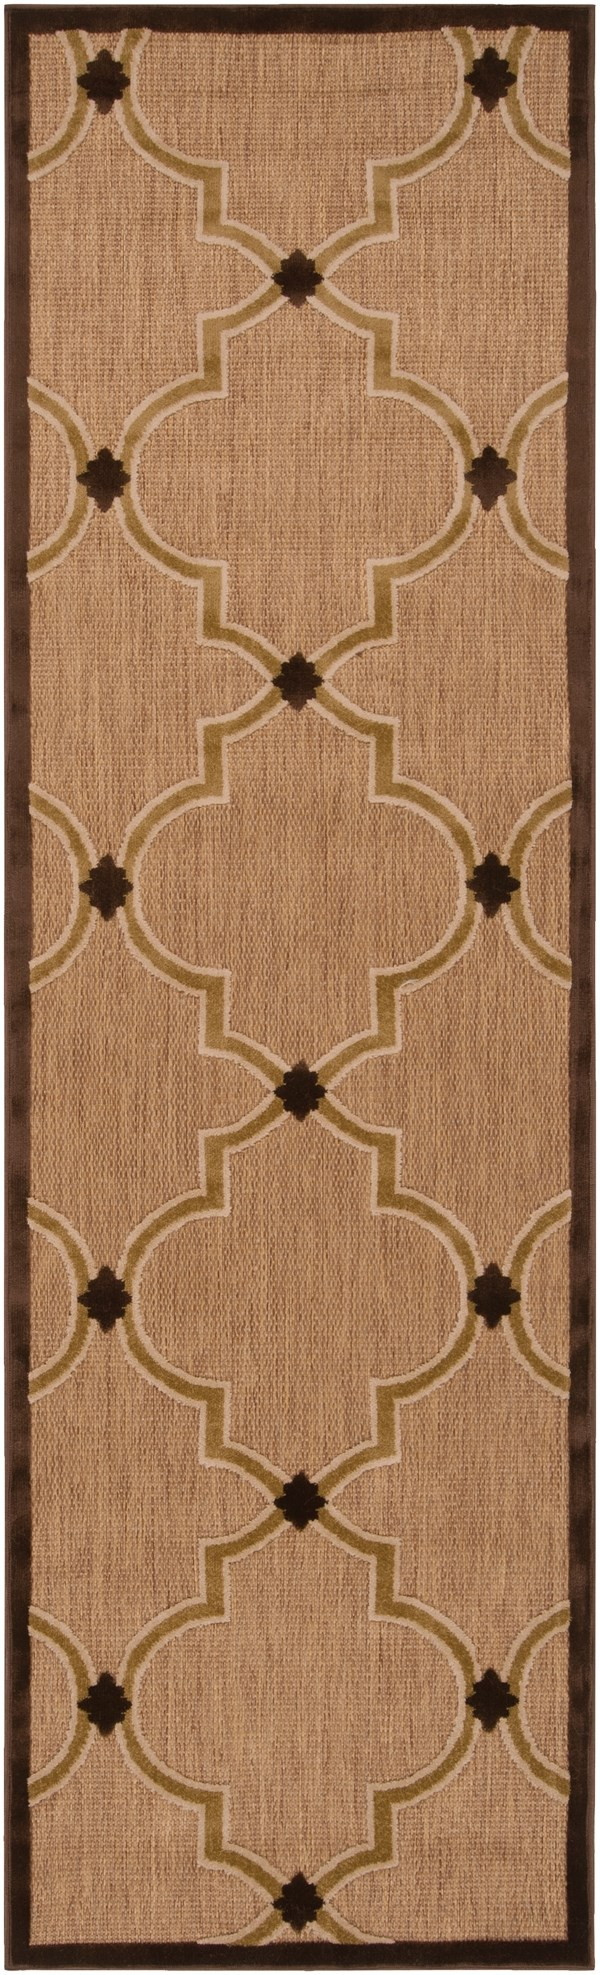 Dark Brown, Beige, Camel, Tan Transitional Area Rug